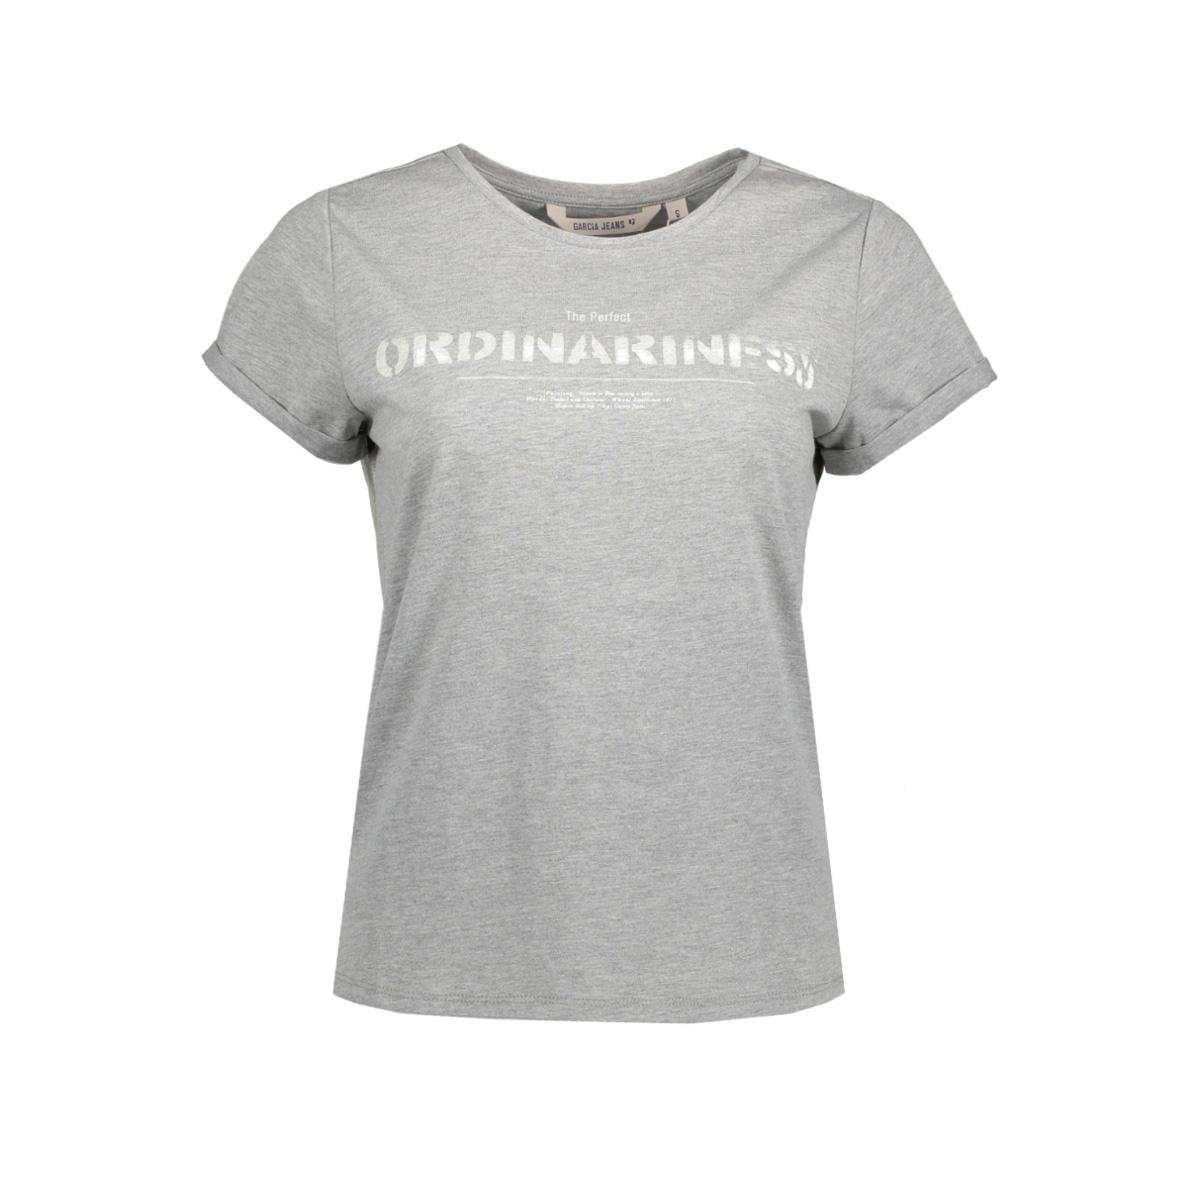 g70002 garcia t-shirt 66 grey melee